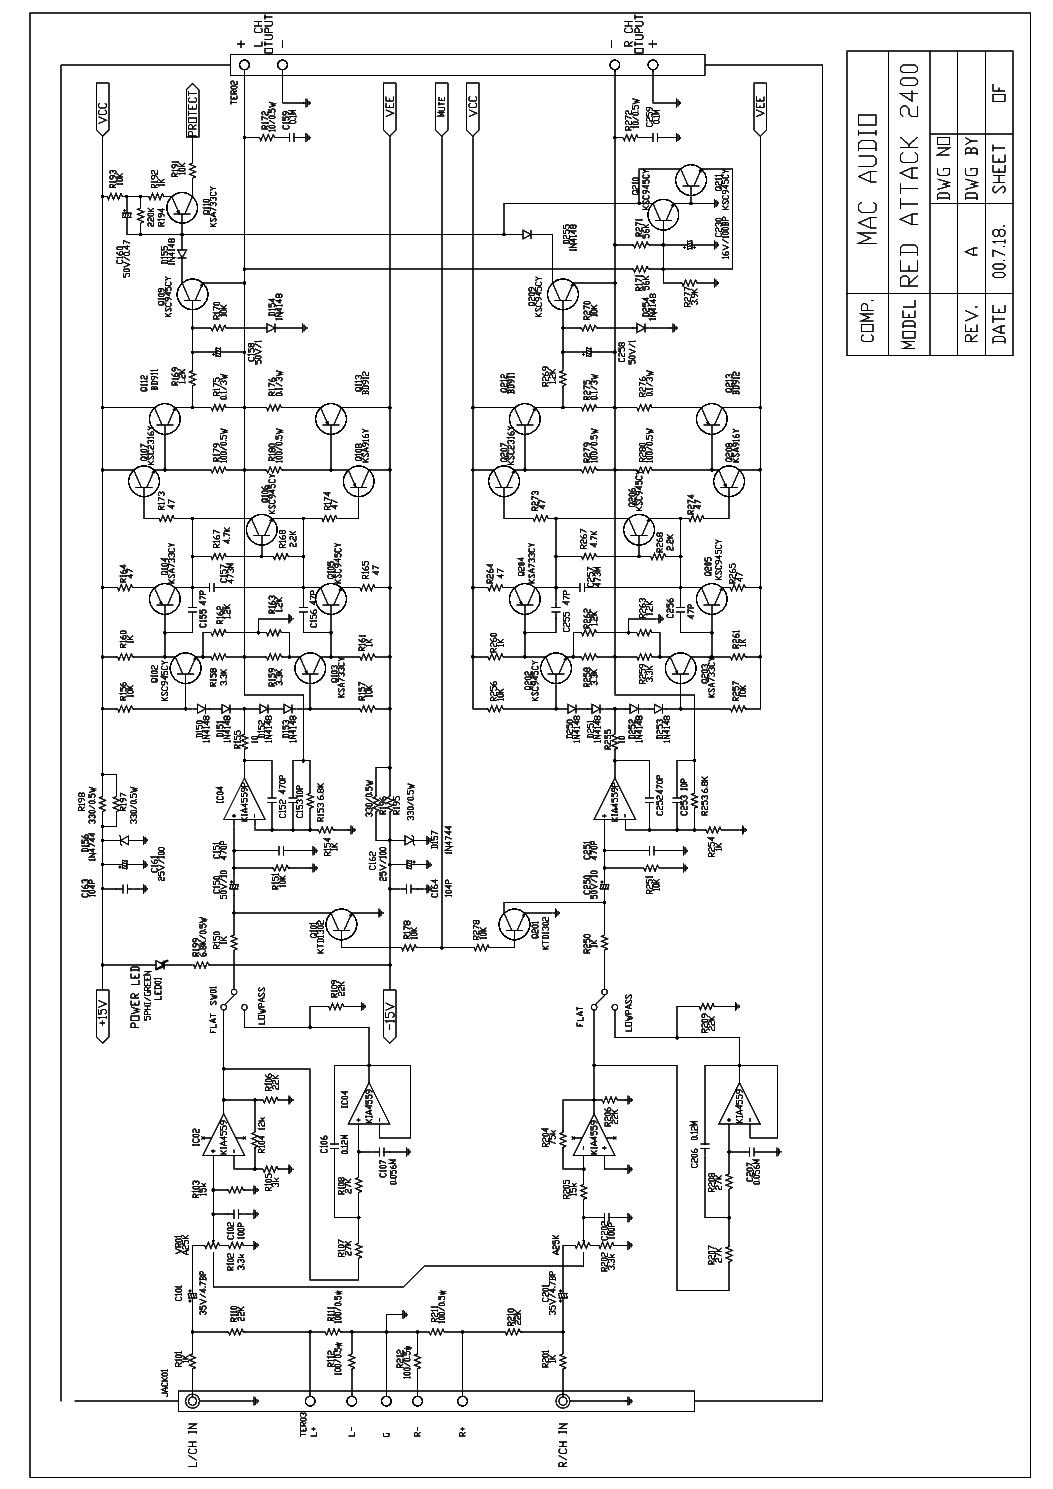 MACAUDIO RED ATTACK 2400 Service Manual Download